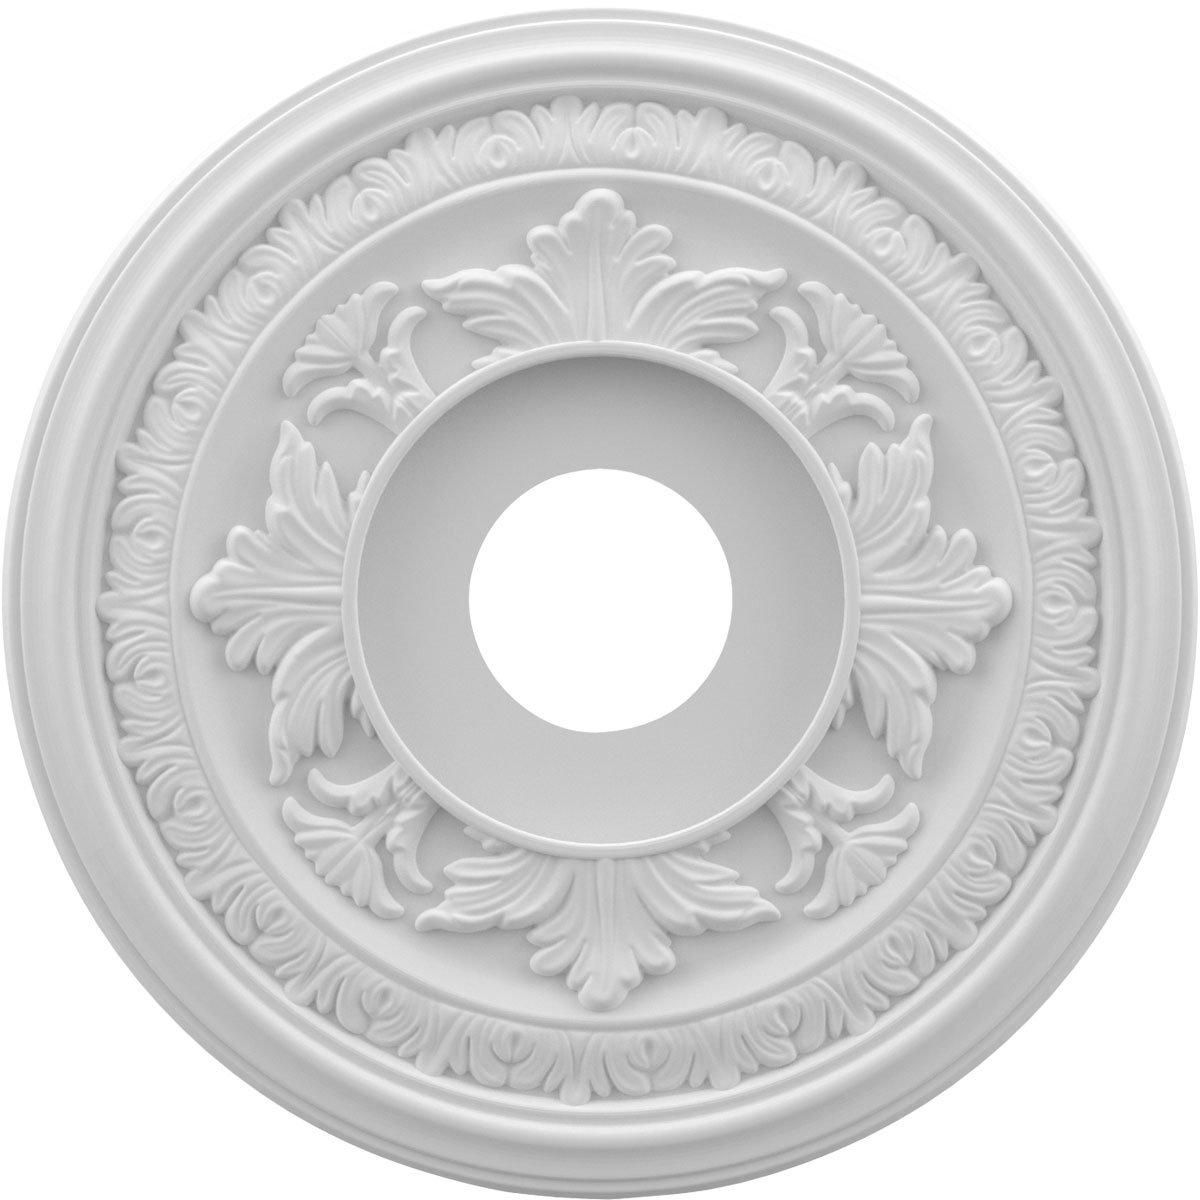 Ekena Millwork CMP16BA Baltimore Medallion Thermoformed Pvc Ceiling, 16'' OD x 3 1/2'' ID x 1'' P, White